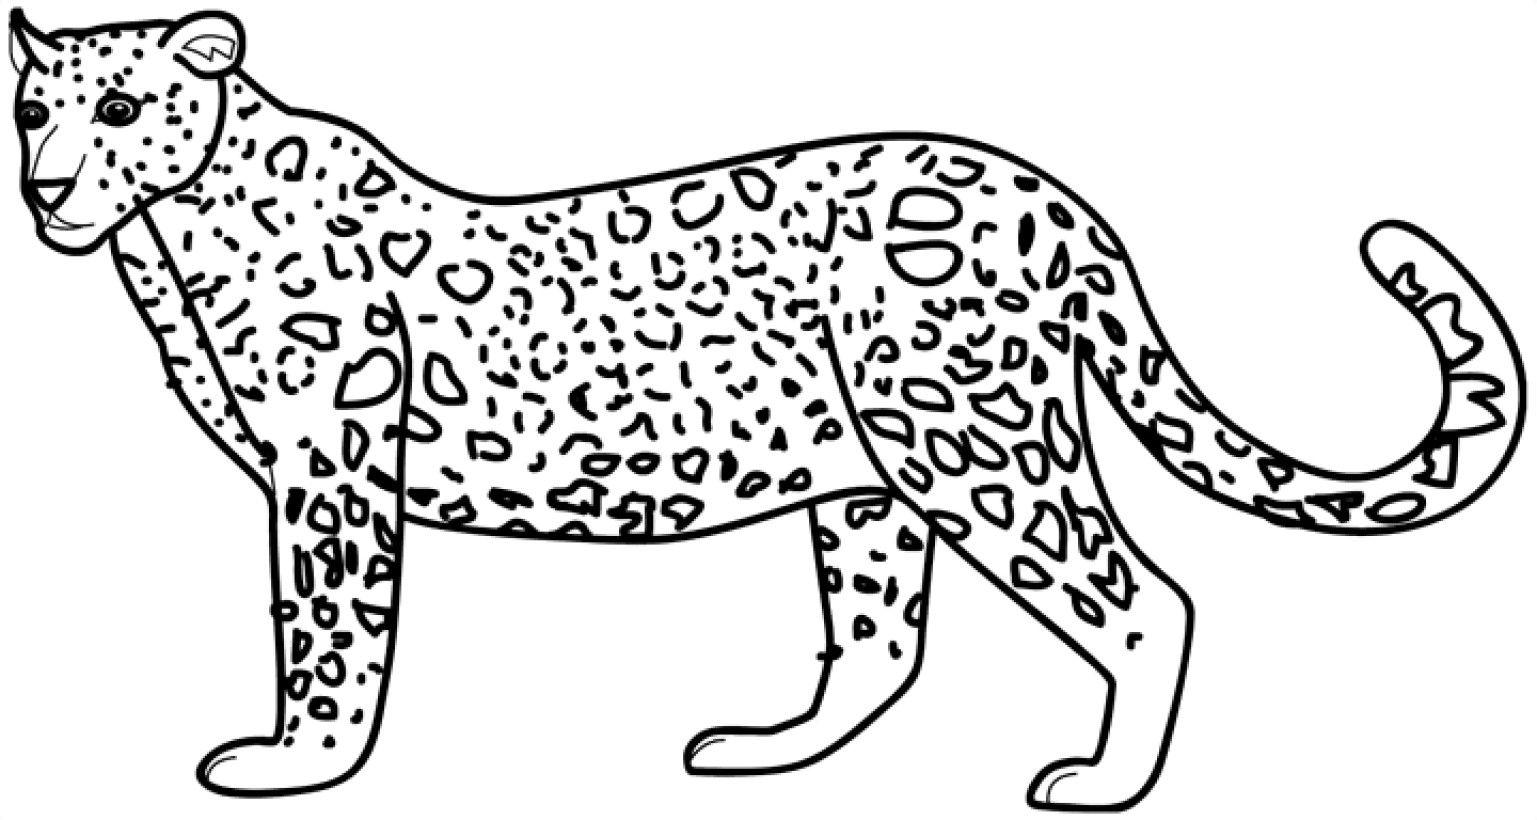 Dibujo Colorear De Leopardo 6 Coloring Pages Coloring Pictures Animal Coloring Pages